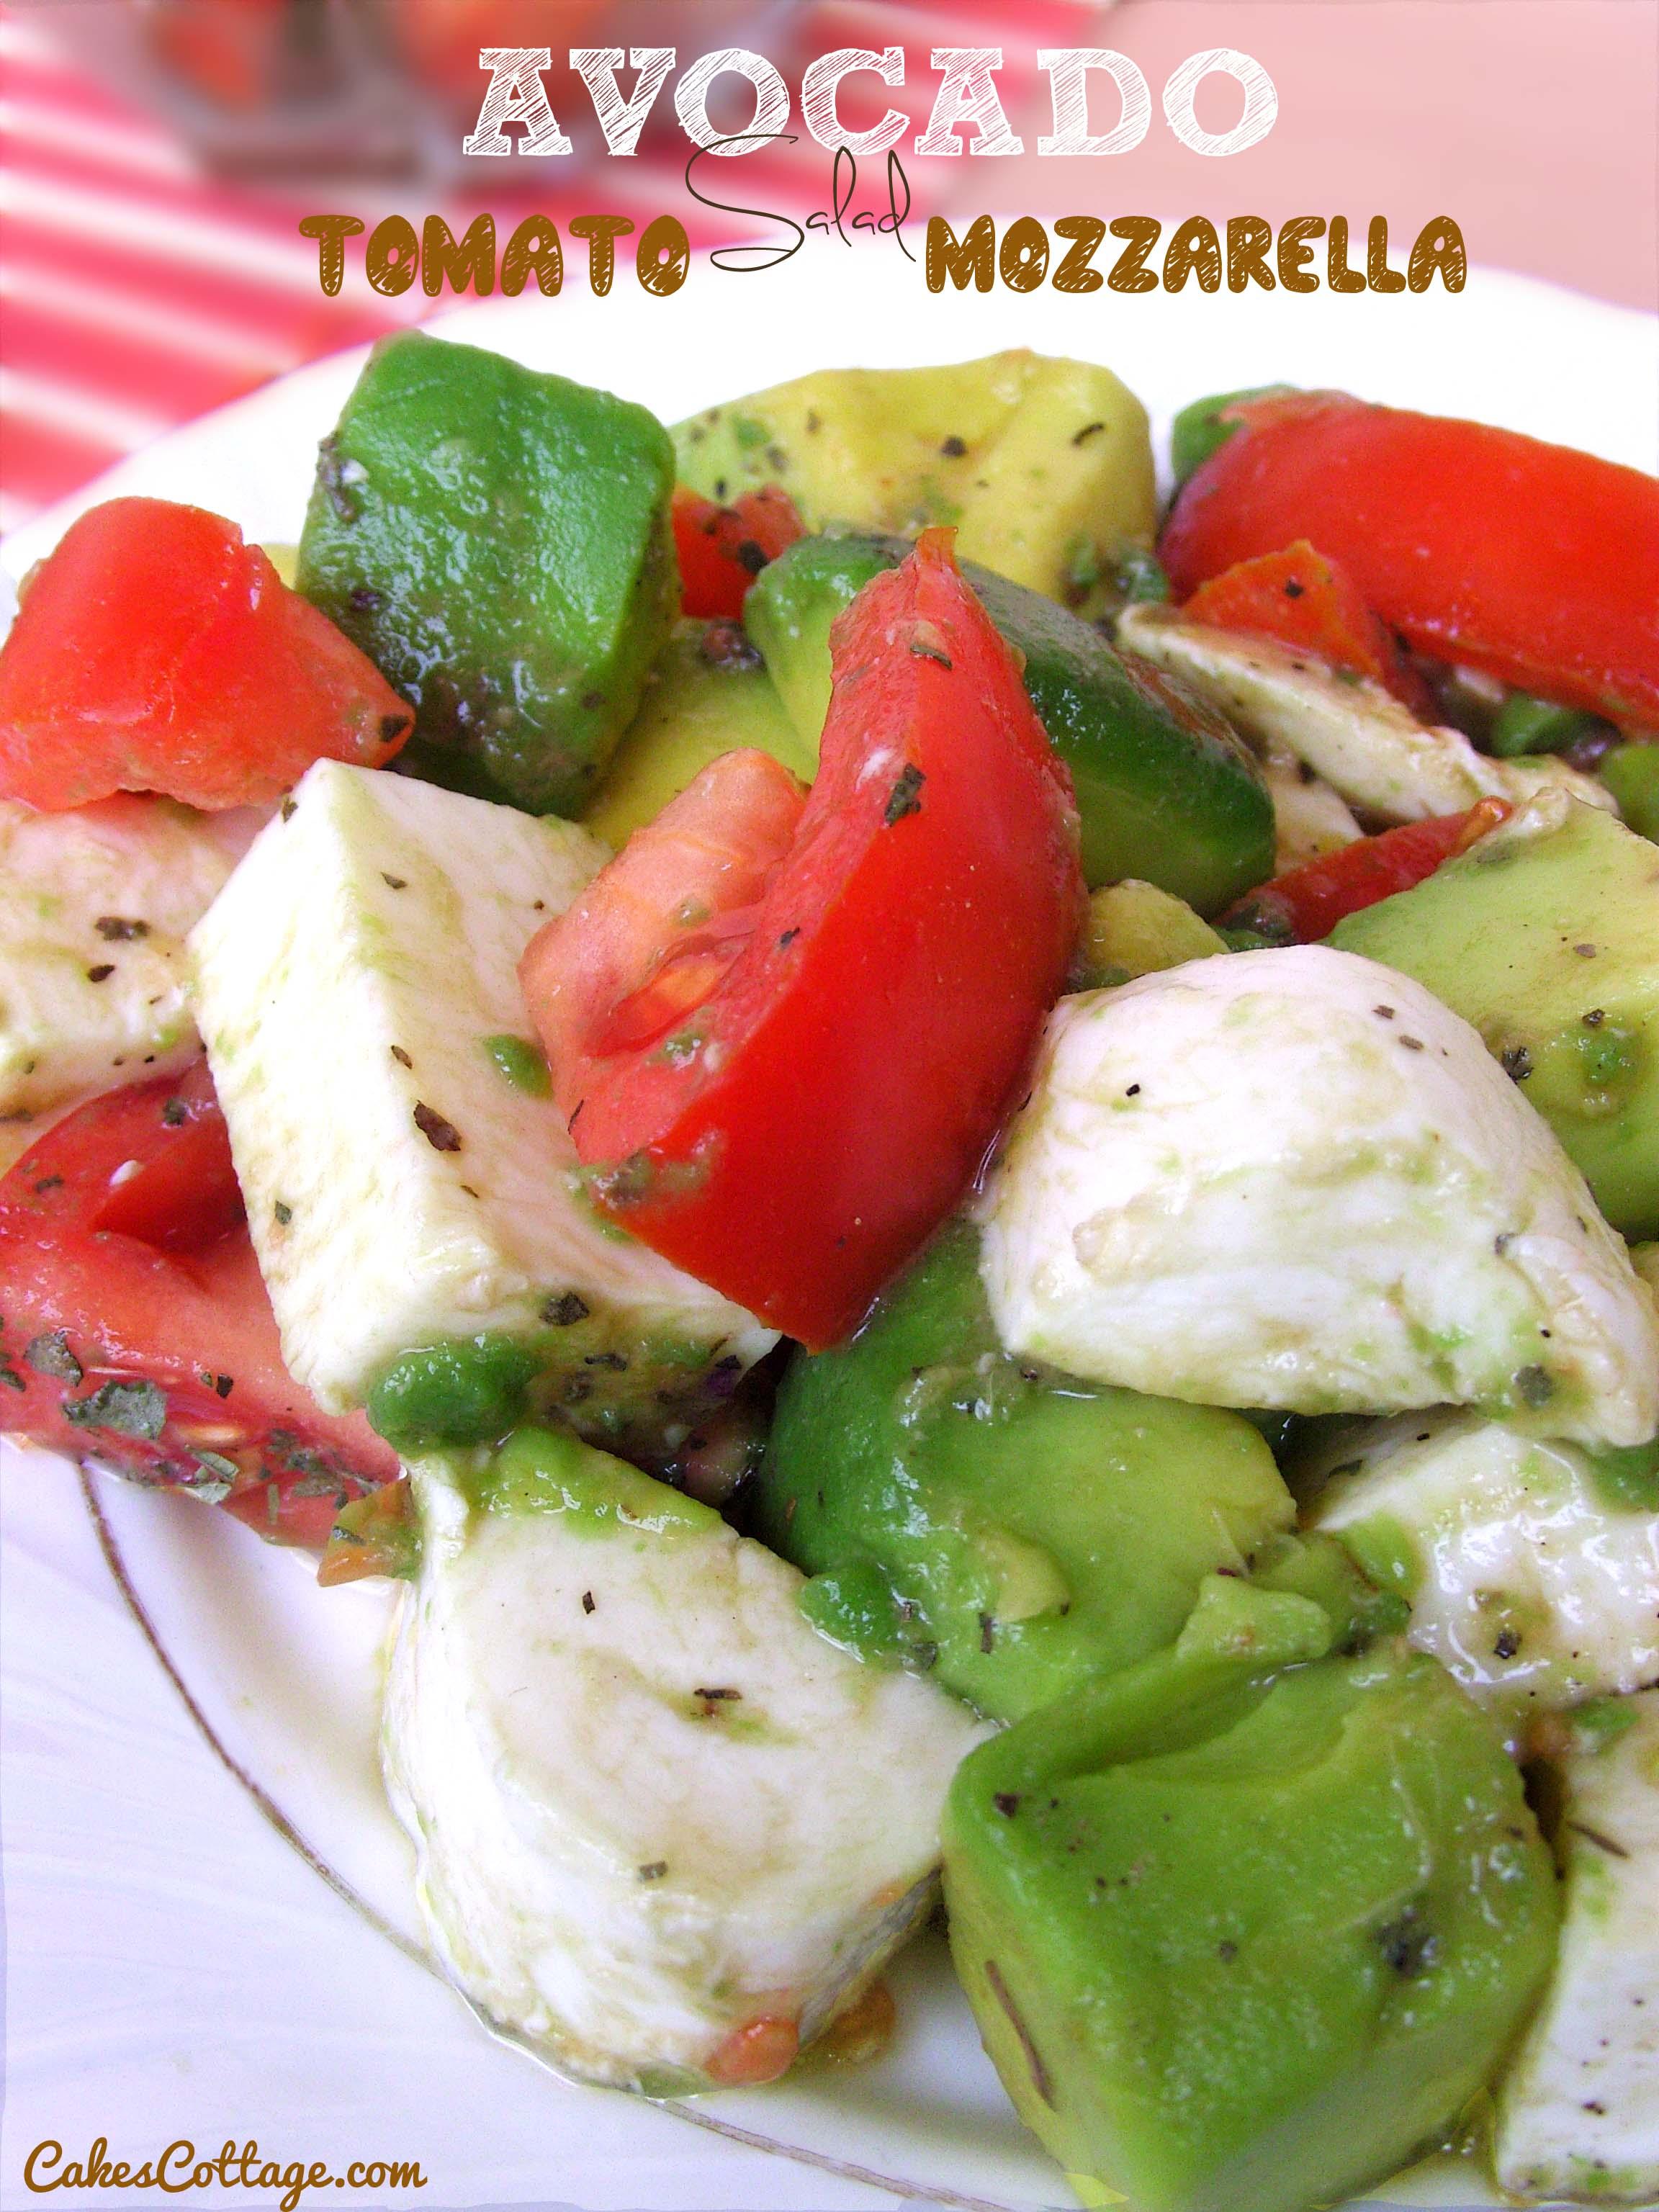 Mozzarella-Avocado-Tomato-Salad